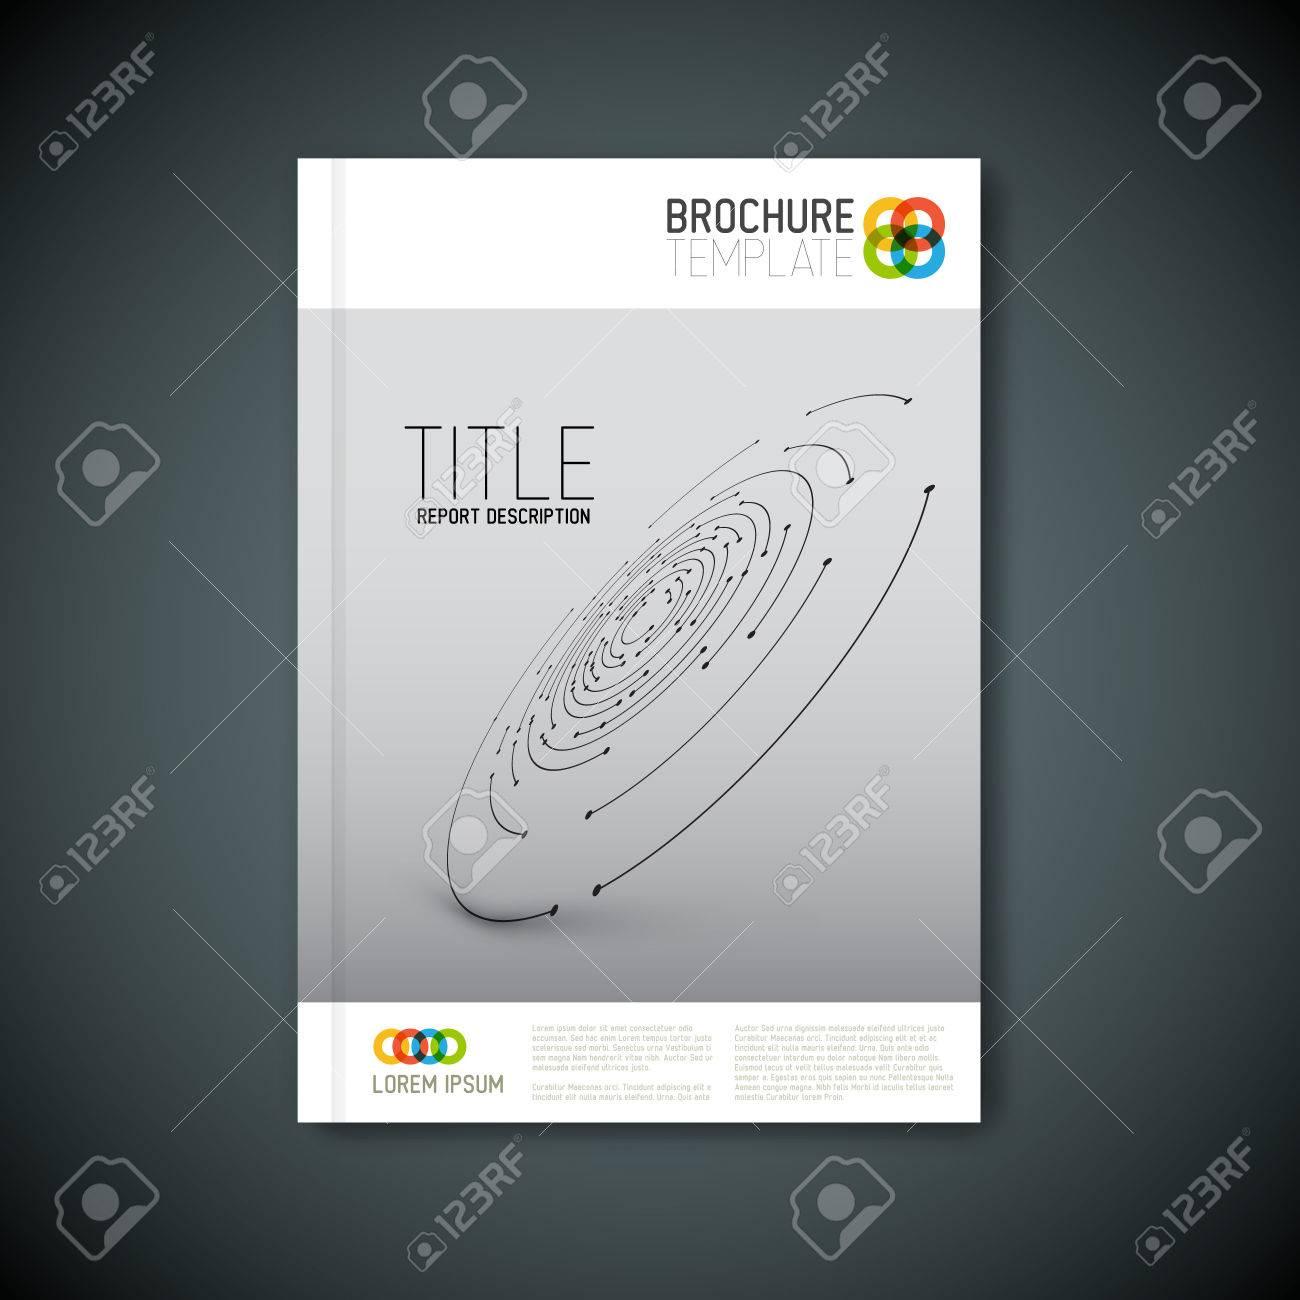 Modern Vector abstract brochure, report or flyer design template - 43216583